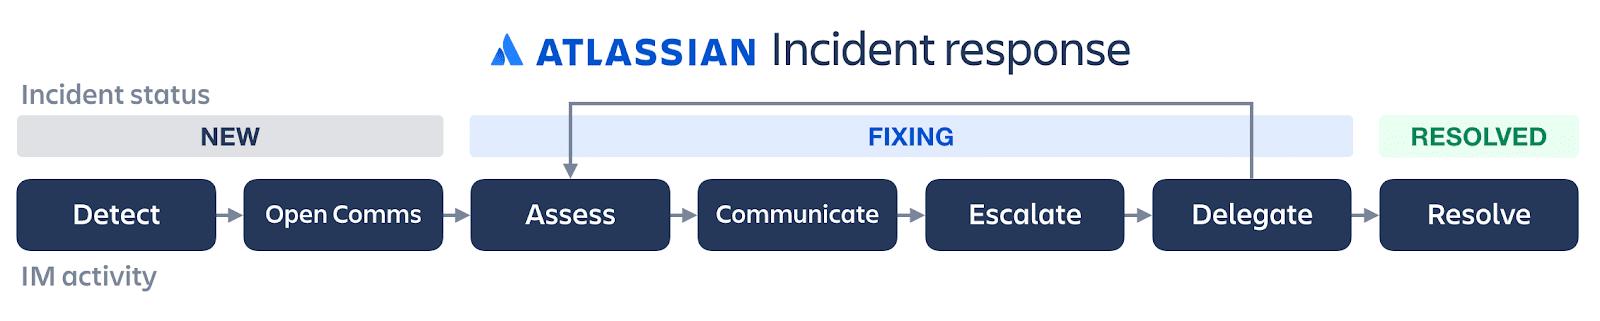 Atlassian のインシデント対応のライフサイクルのチャート